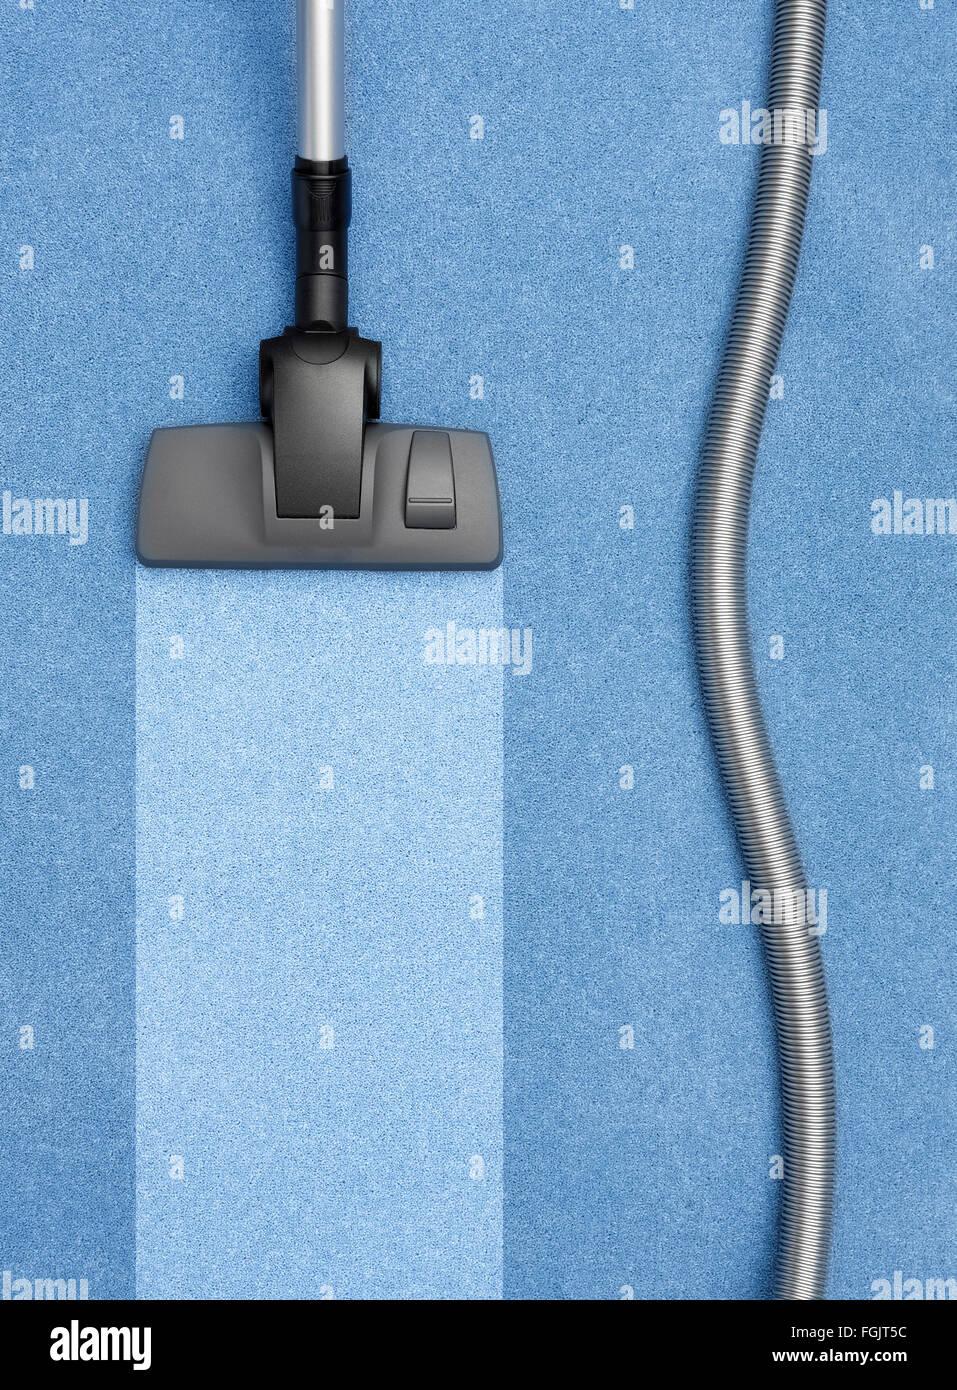 Le tapis nettoyage Aspirateur Photo Stock